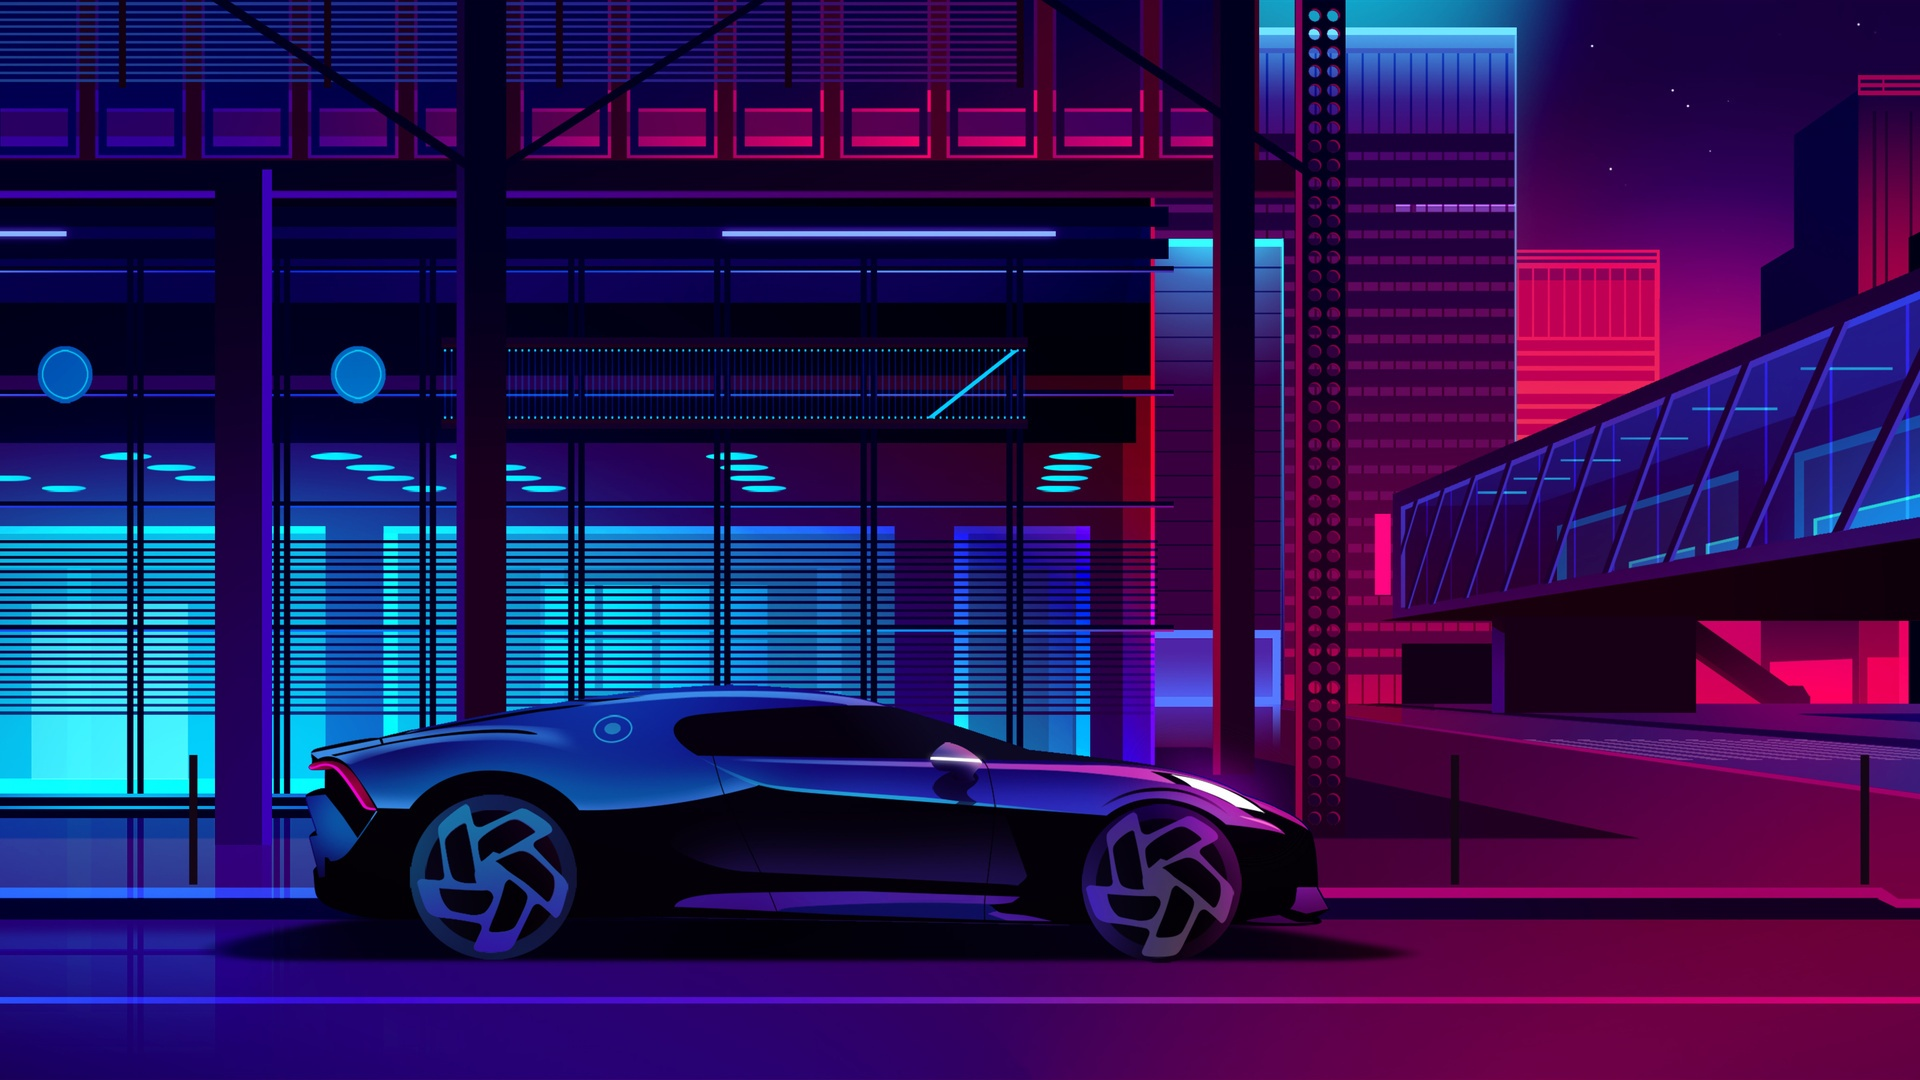 Neon laptop wallpaper